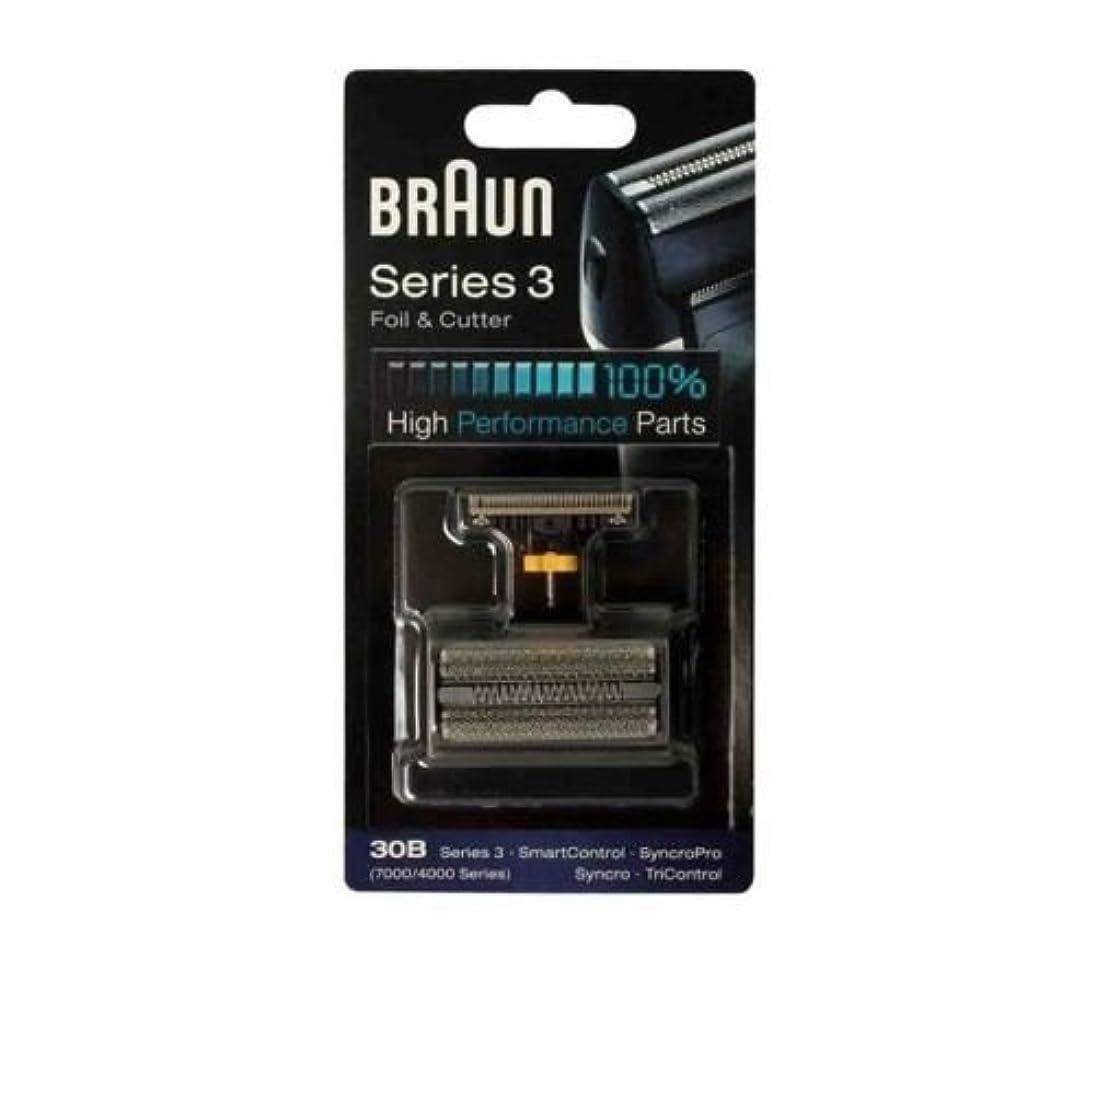 Braun 30B コンビ 30B フォイルカッターの交換パック(4000分の7000シリーズ) [並行輸入品]